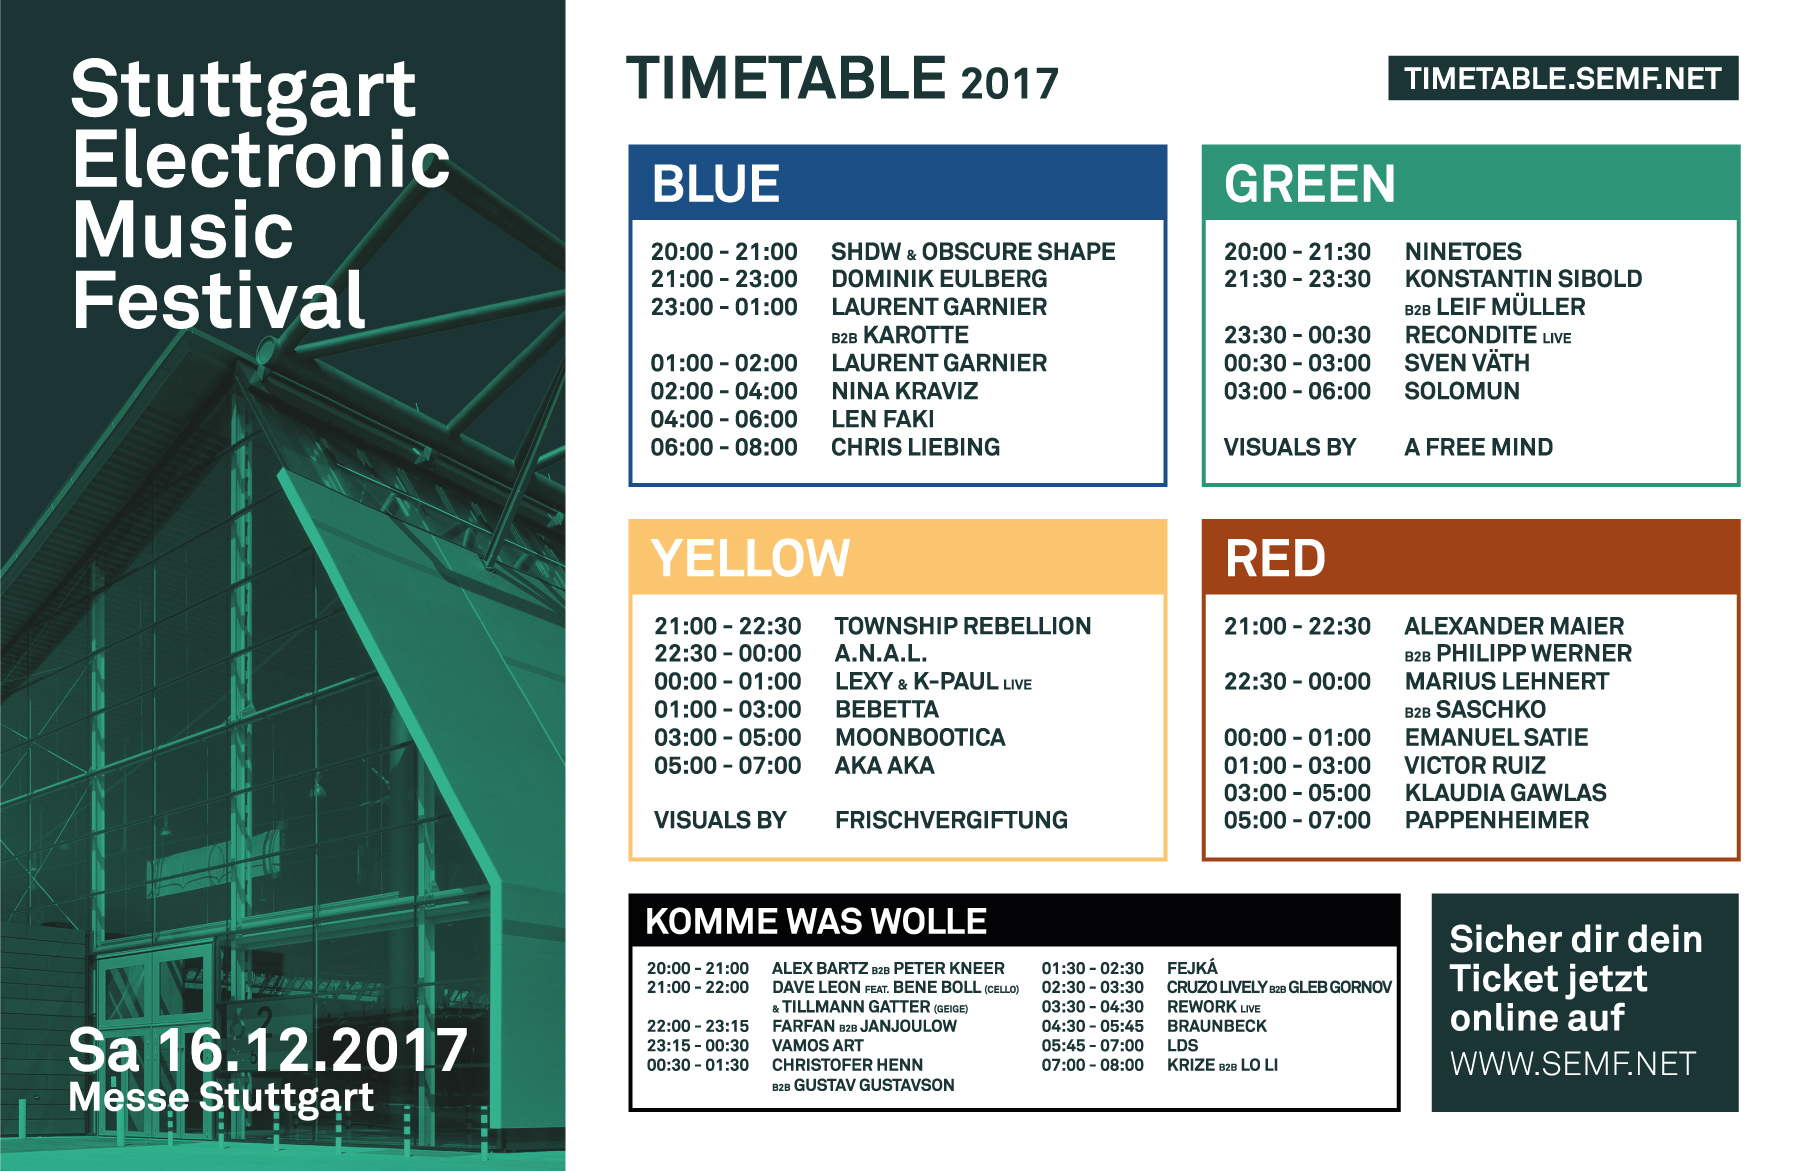 SEMF 2017 Timetable